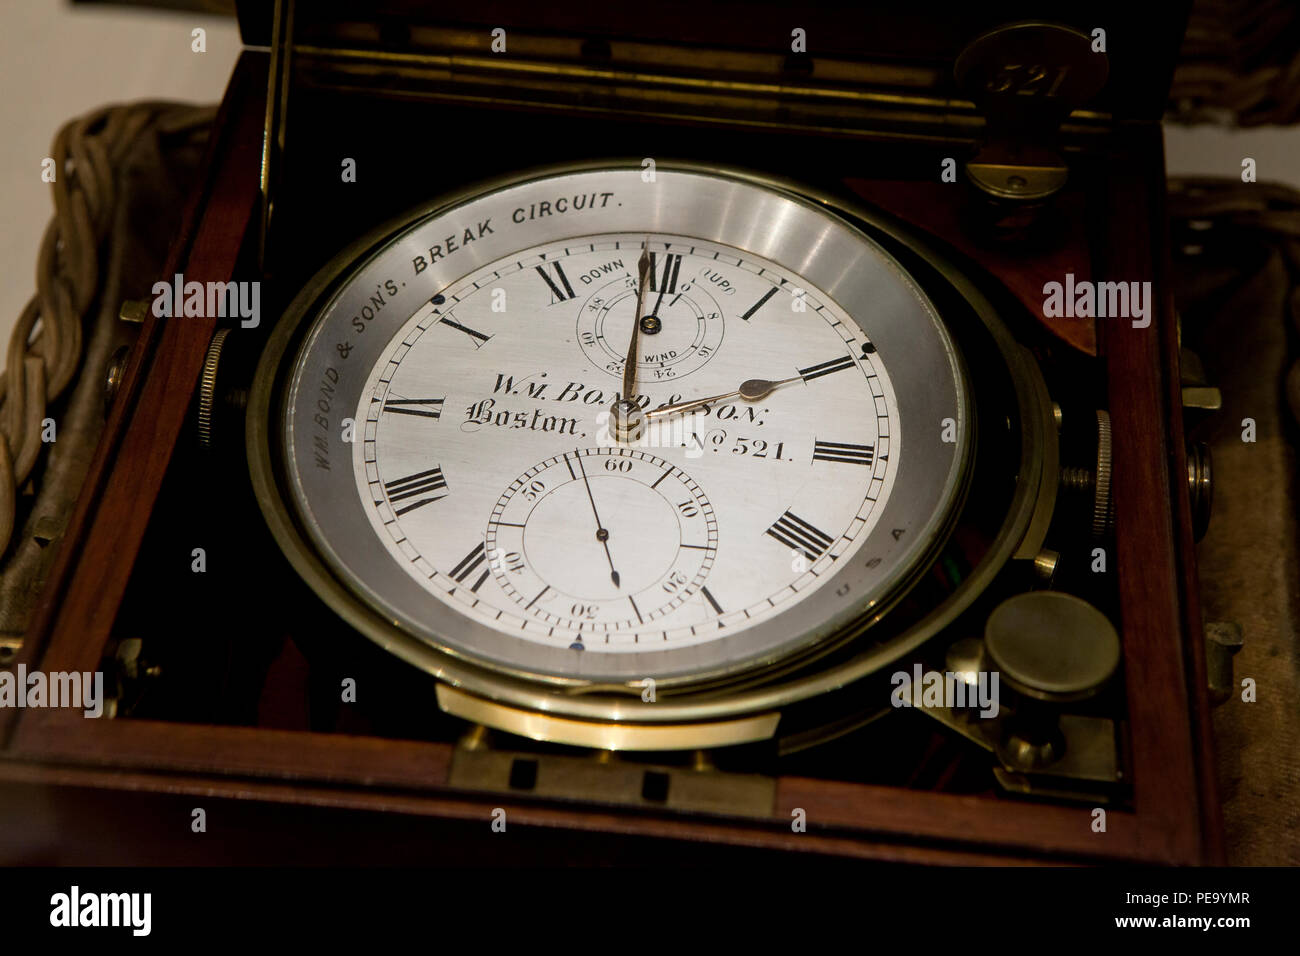 Vintage Marine Chronometer, William Bond & Son, circa 1870 - USA - Stock Image